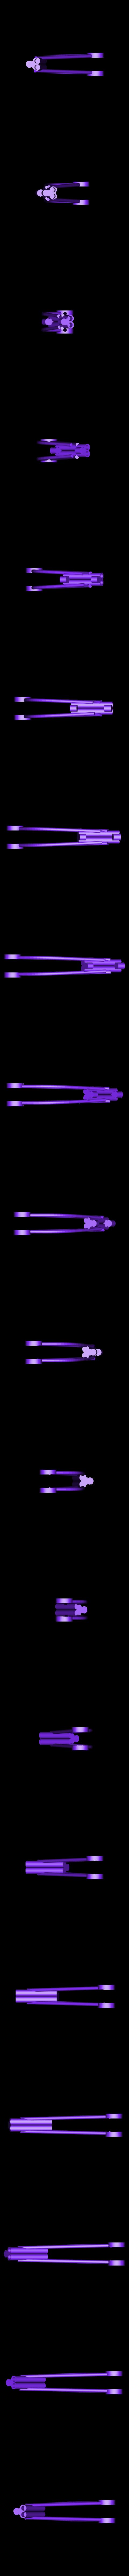 new_voorvork.stl Download free STL file bicycle lowglider model • 3D printable template, jasperbaudoin